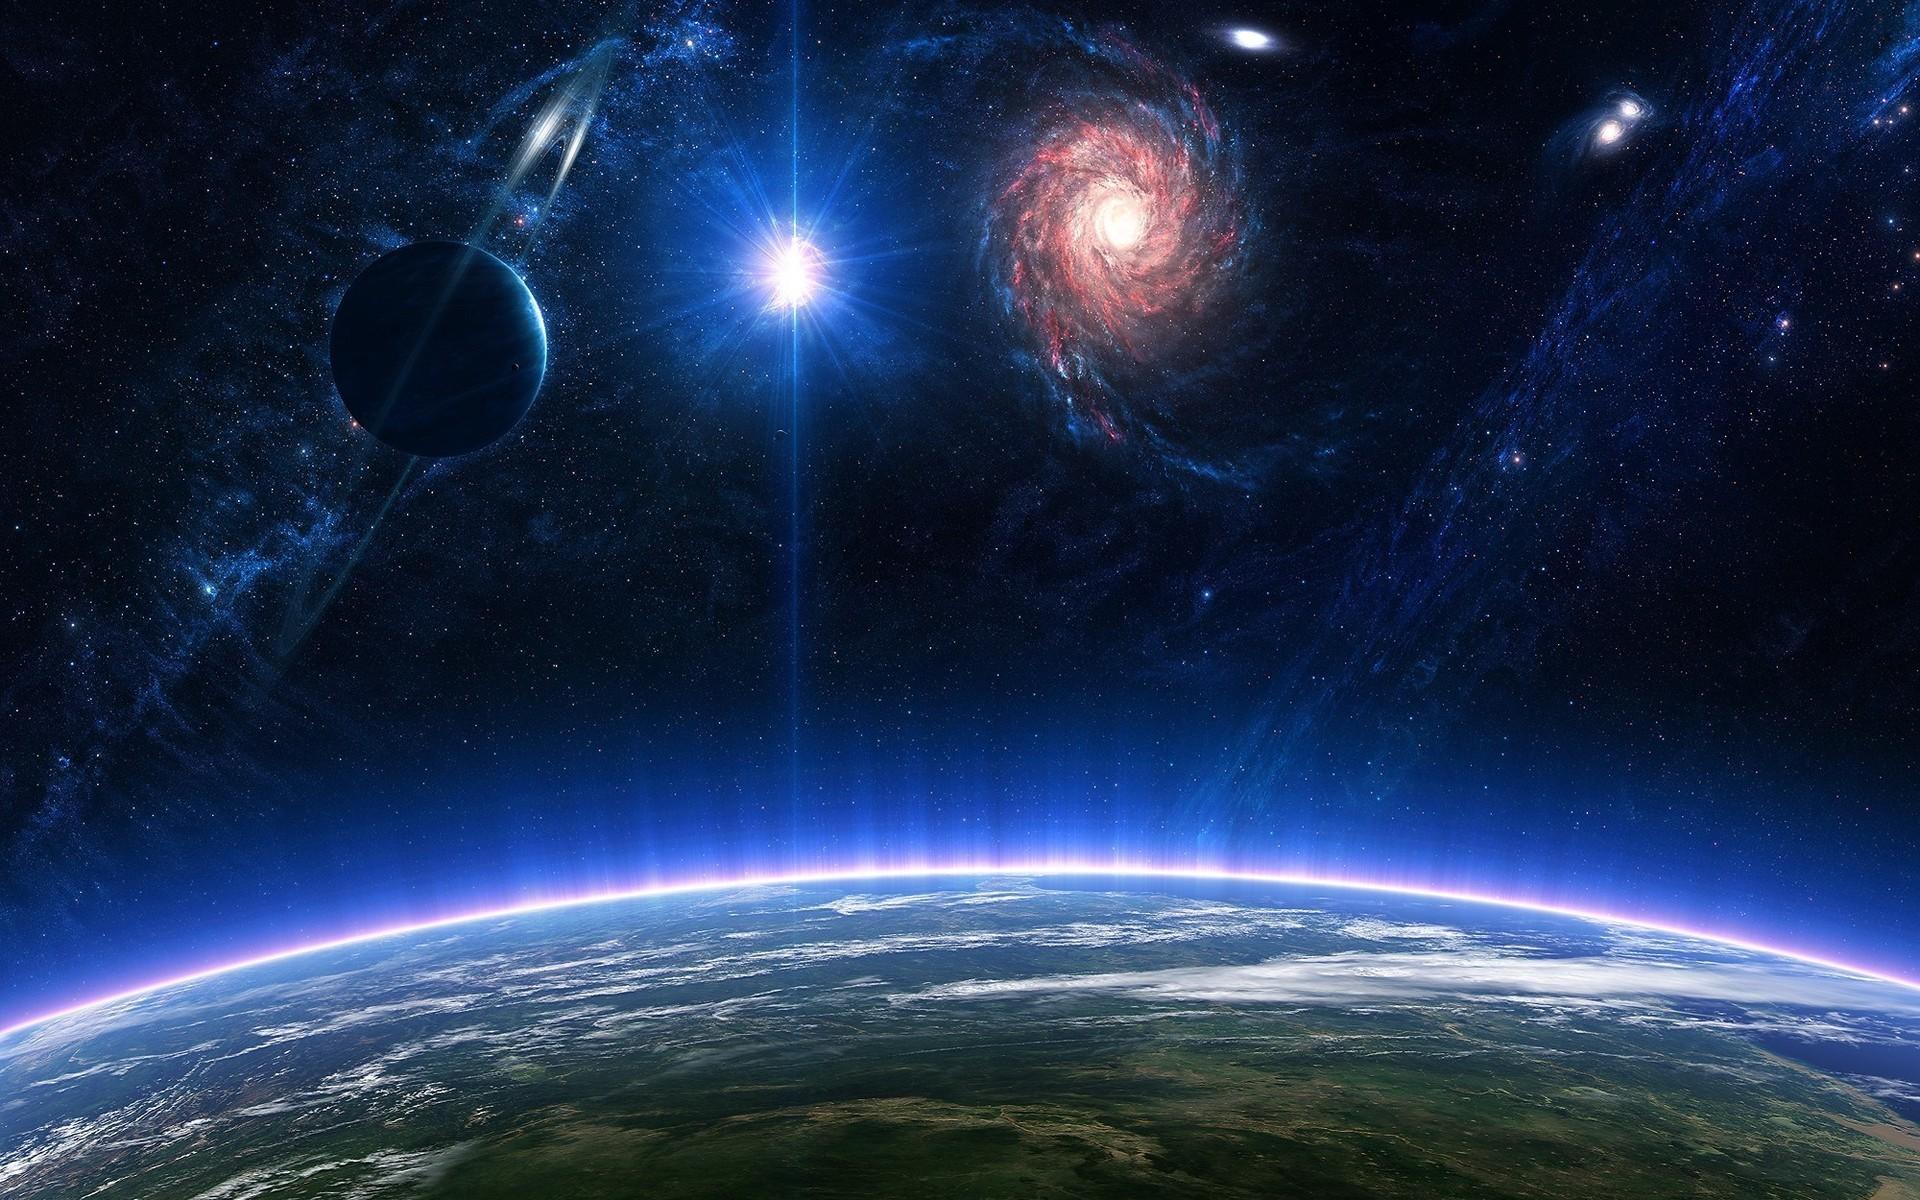 Planet planets stars nebula galaxy atmosphere space ...